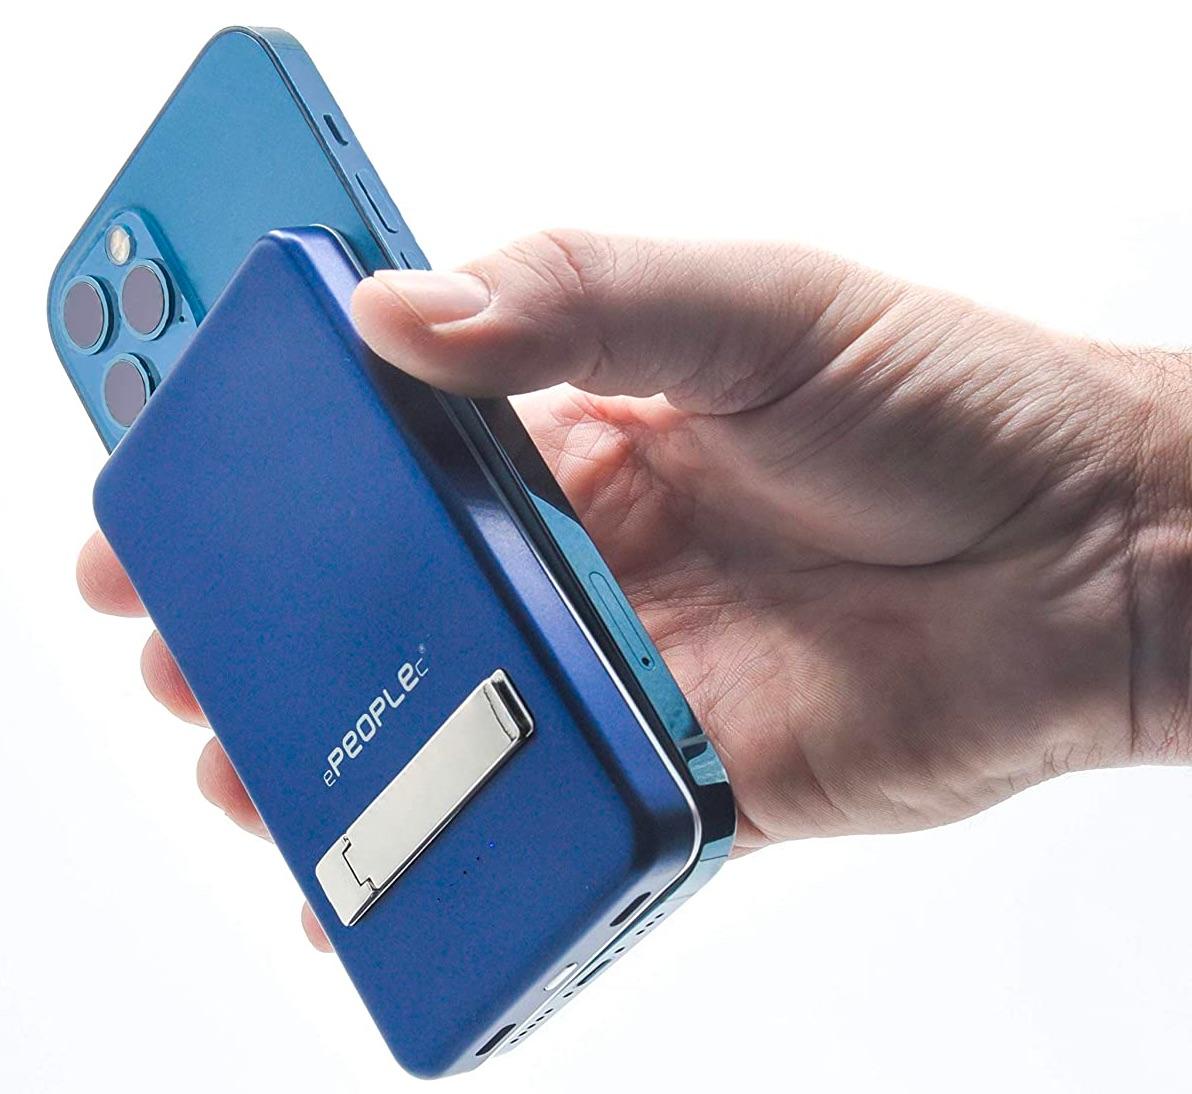 Batería MagSafe china